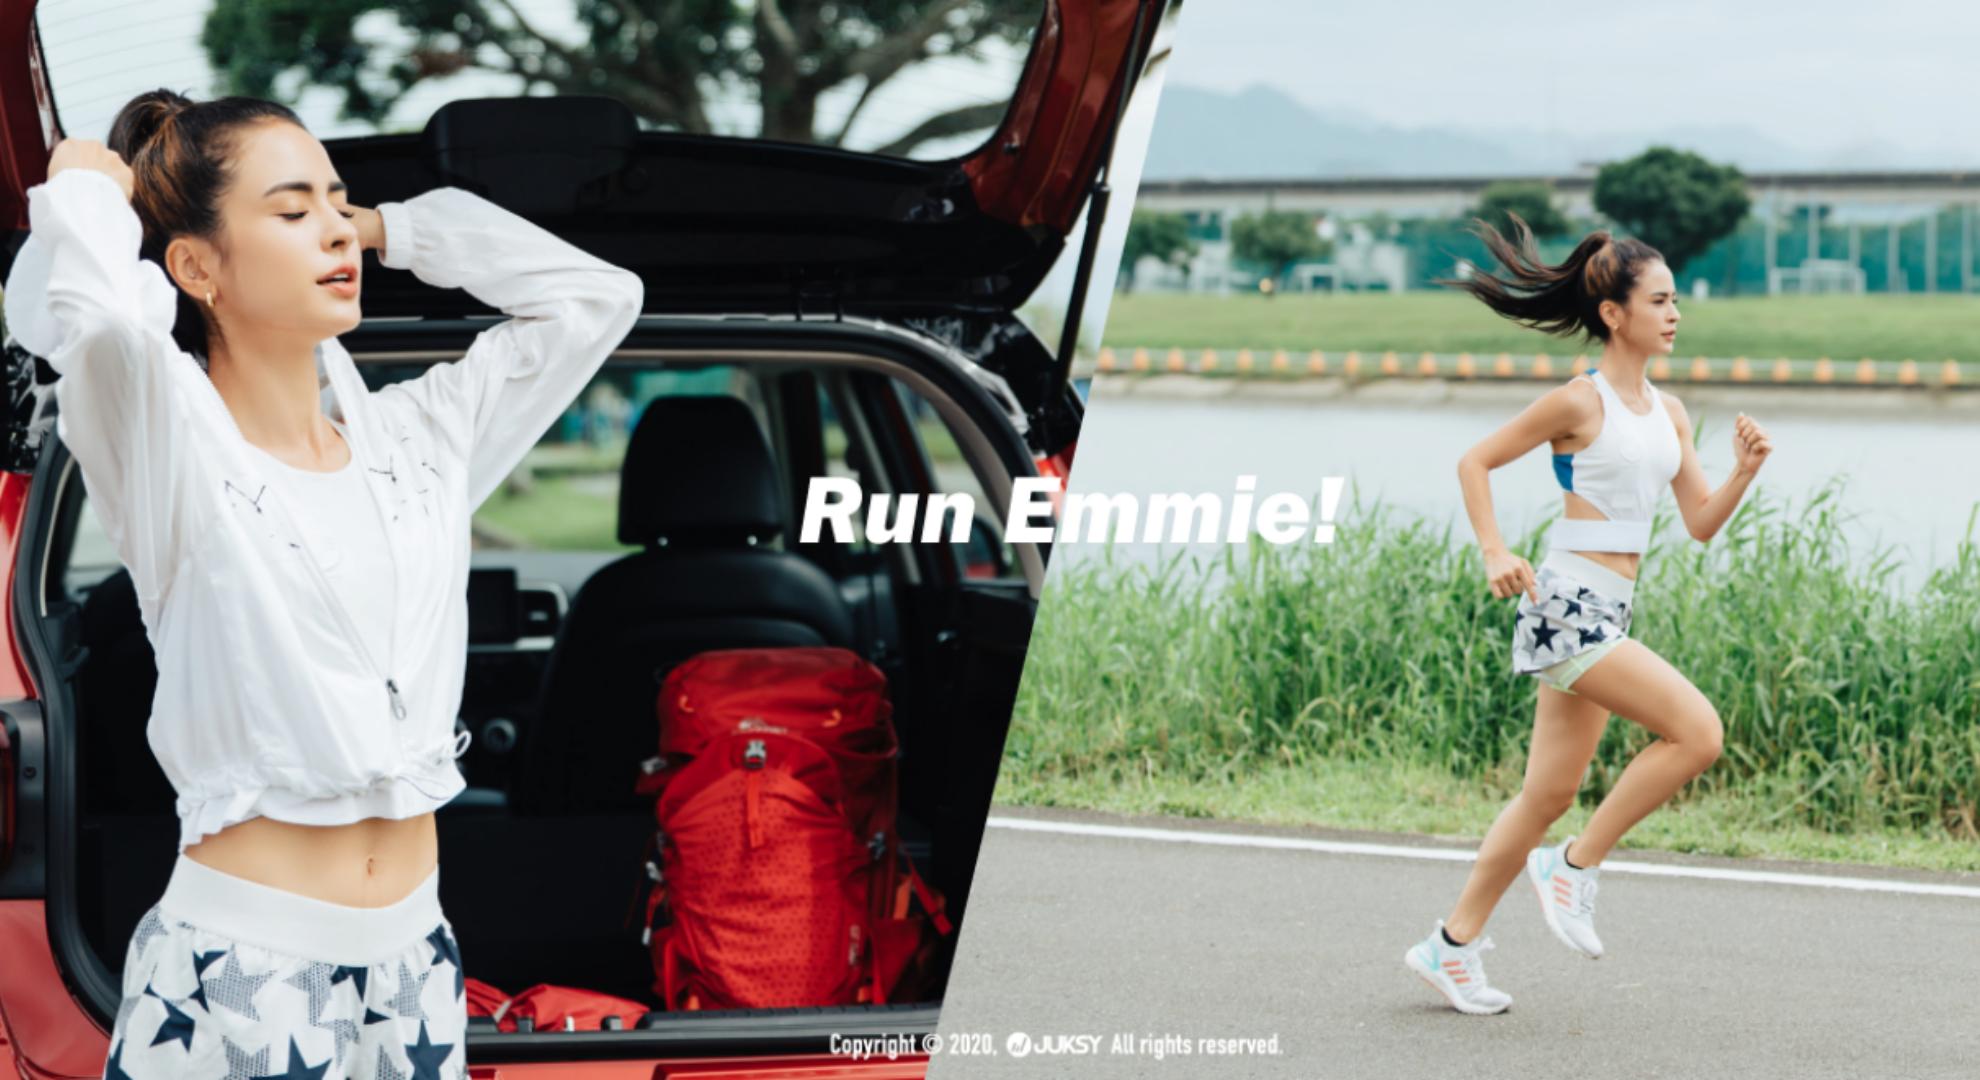 "Hyundai HyundaiVenue 「不只是演員,還是出色跑者 !」,角色再多,雷艾美從不忘記做自己最真的樣子,Hyundai Venue 的存在就是要滿足她的""Me time""質量!"